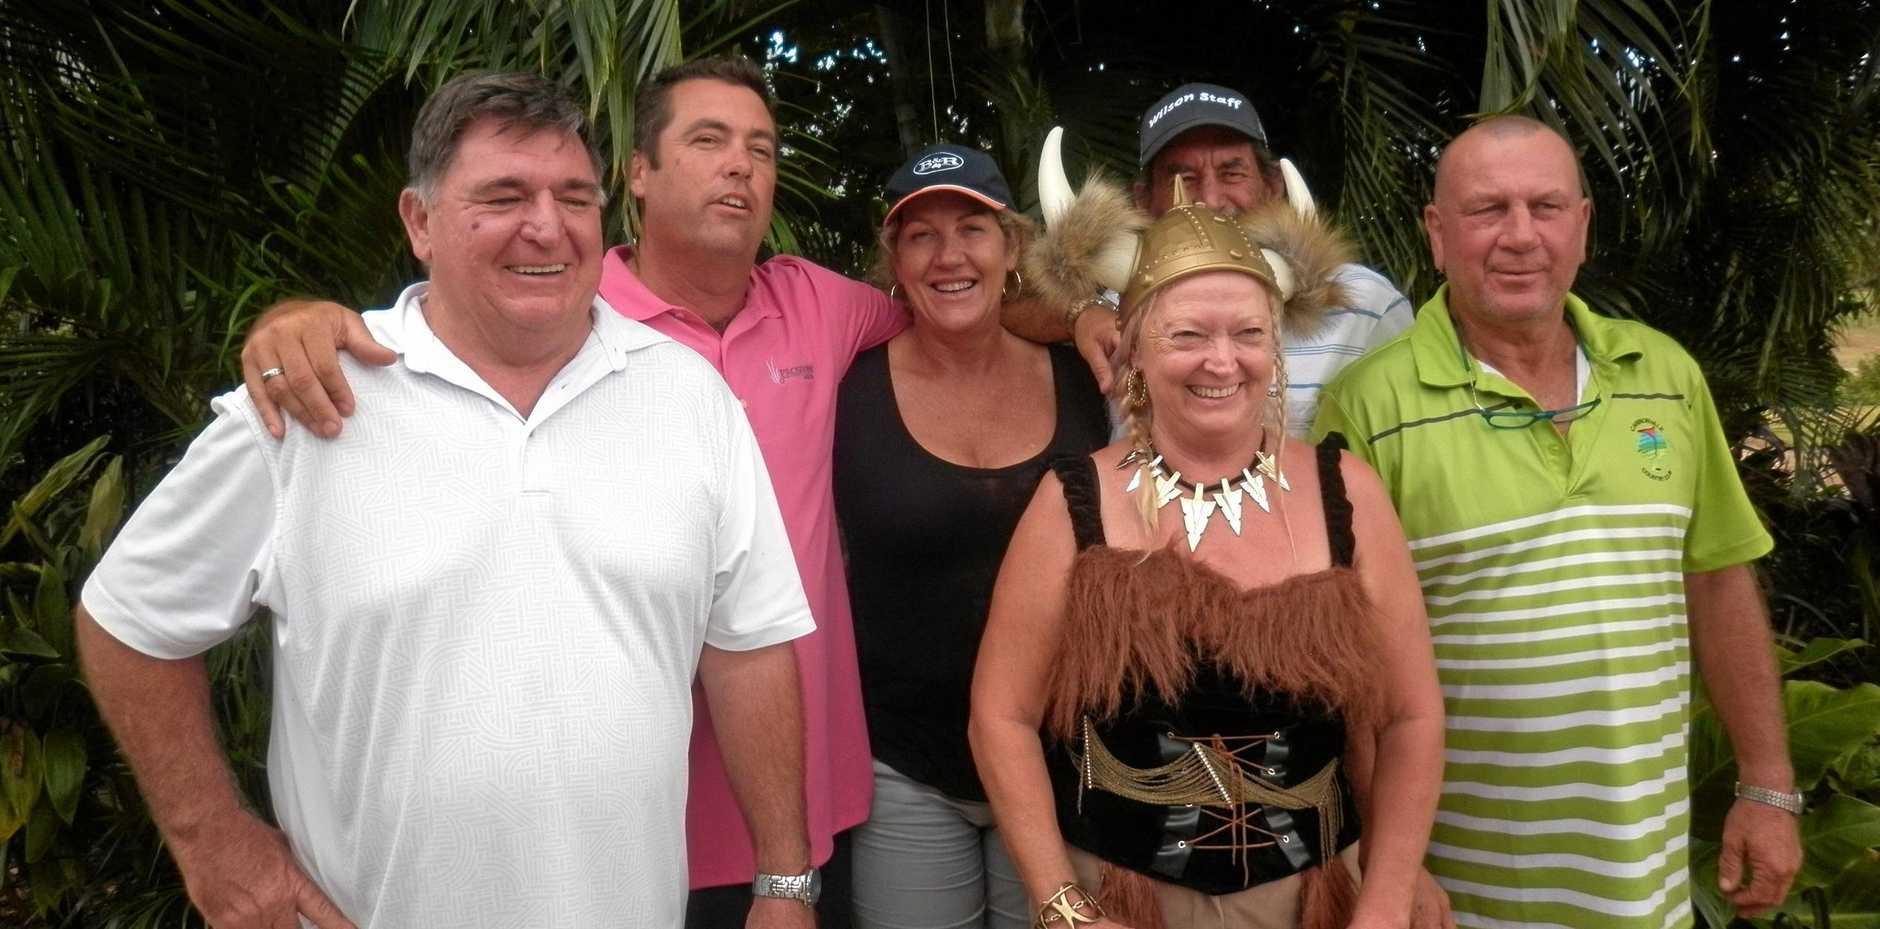 SUCCESS: Paul Nicol, Roger Vandenberg, Penny Wardroper, Joanne Moynihan, Marl McDougall, Scotty Wardroper had a good time at Whitsunday Golf.